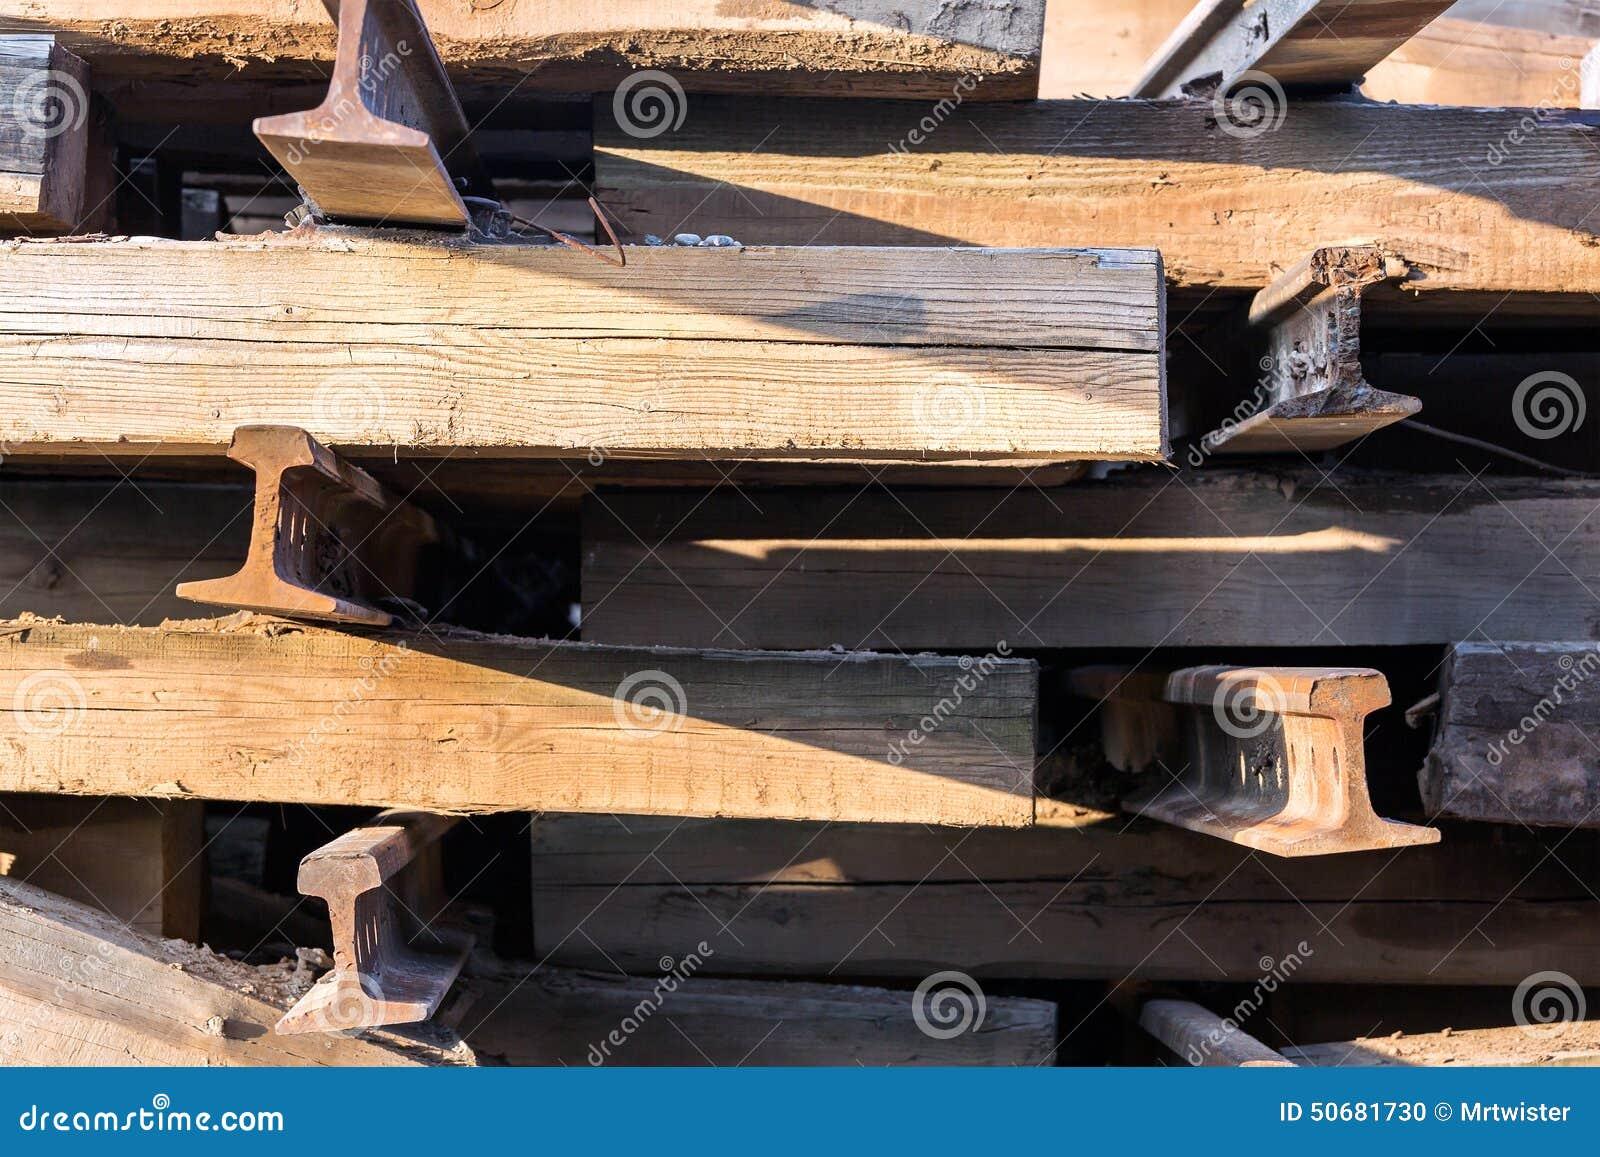 Download 老木铁路睡眠者 库存照片. 图片 包括有 跟踪, 木料, 金属, 硬木, 旧货, 运输, 堆积, 木材, 日志 - 50681730